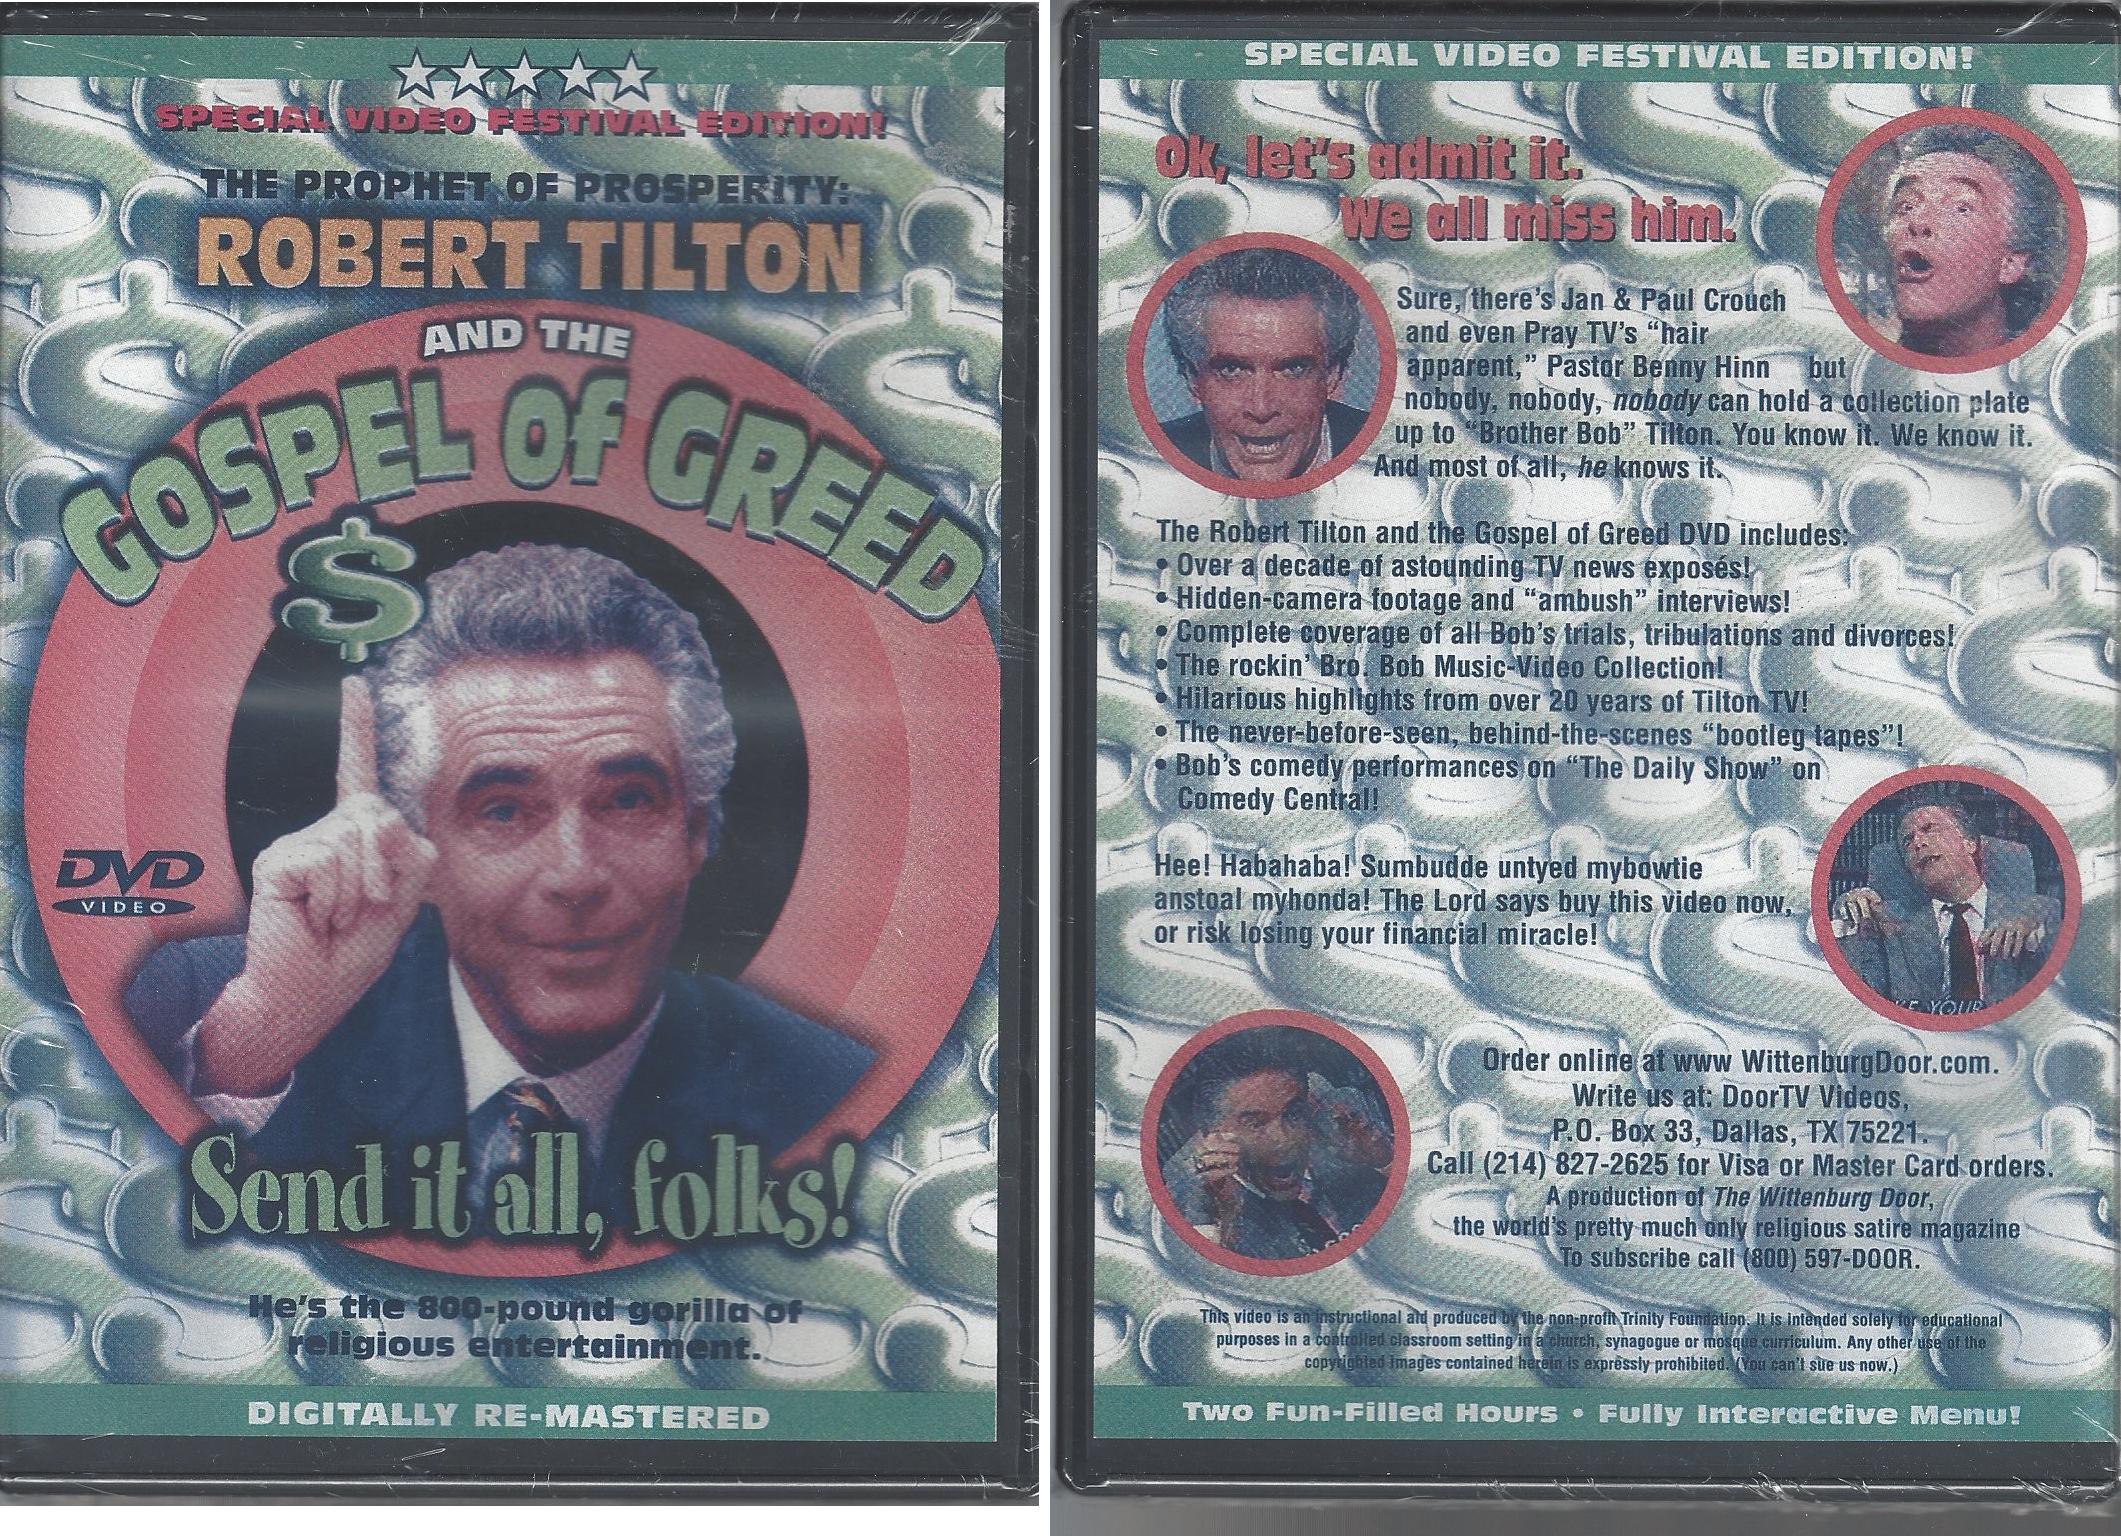 robert tilton gospel of greed dvd